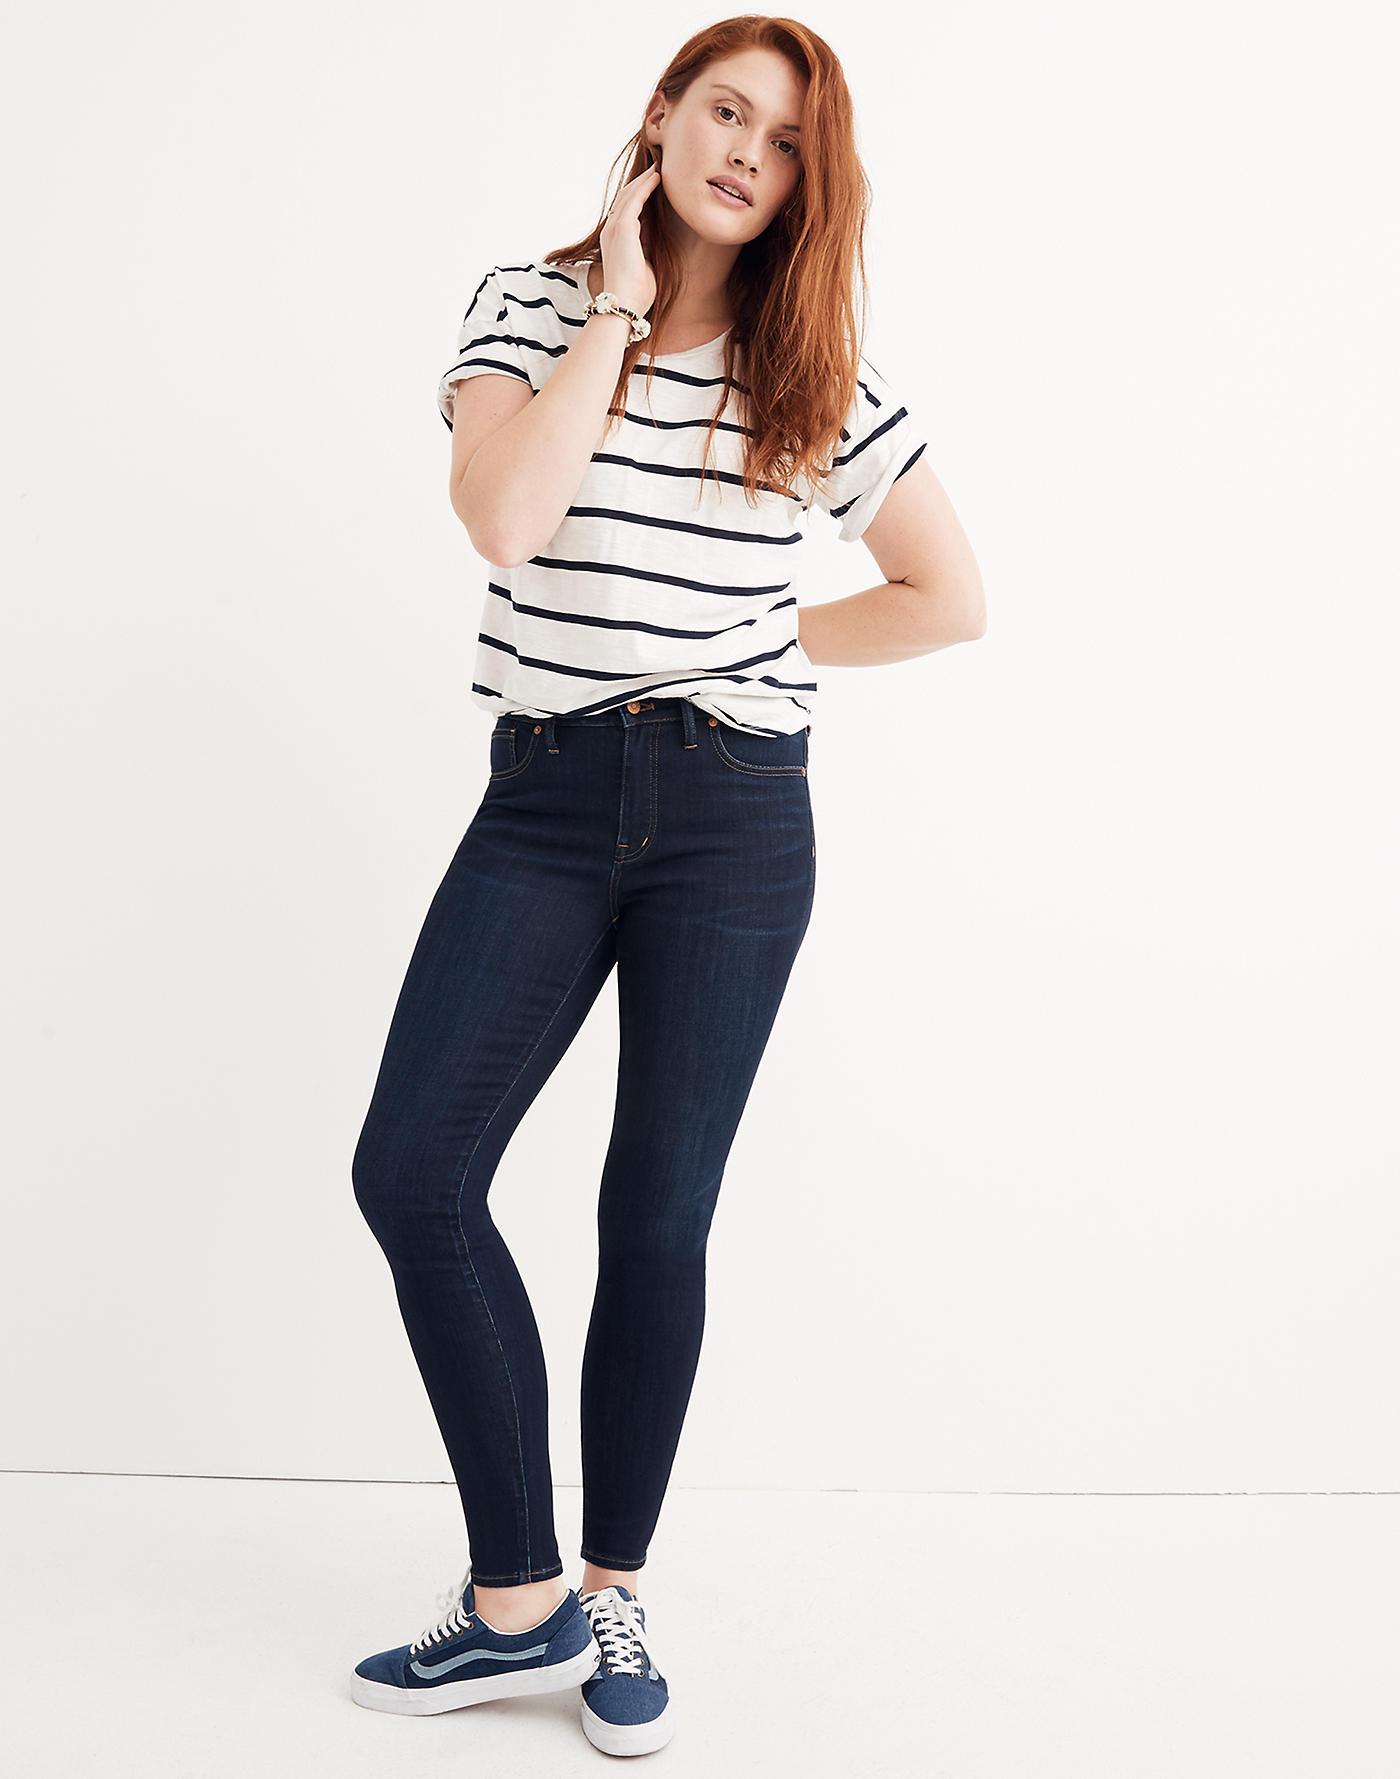 Madewell 9 Mid-Rise Skinny Jeans in Larkspur Wash: TENCEL Denim Edition